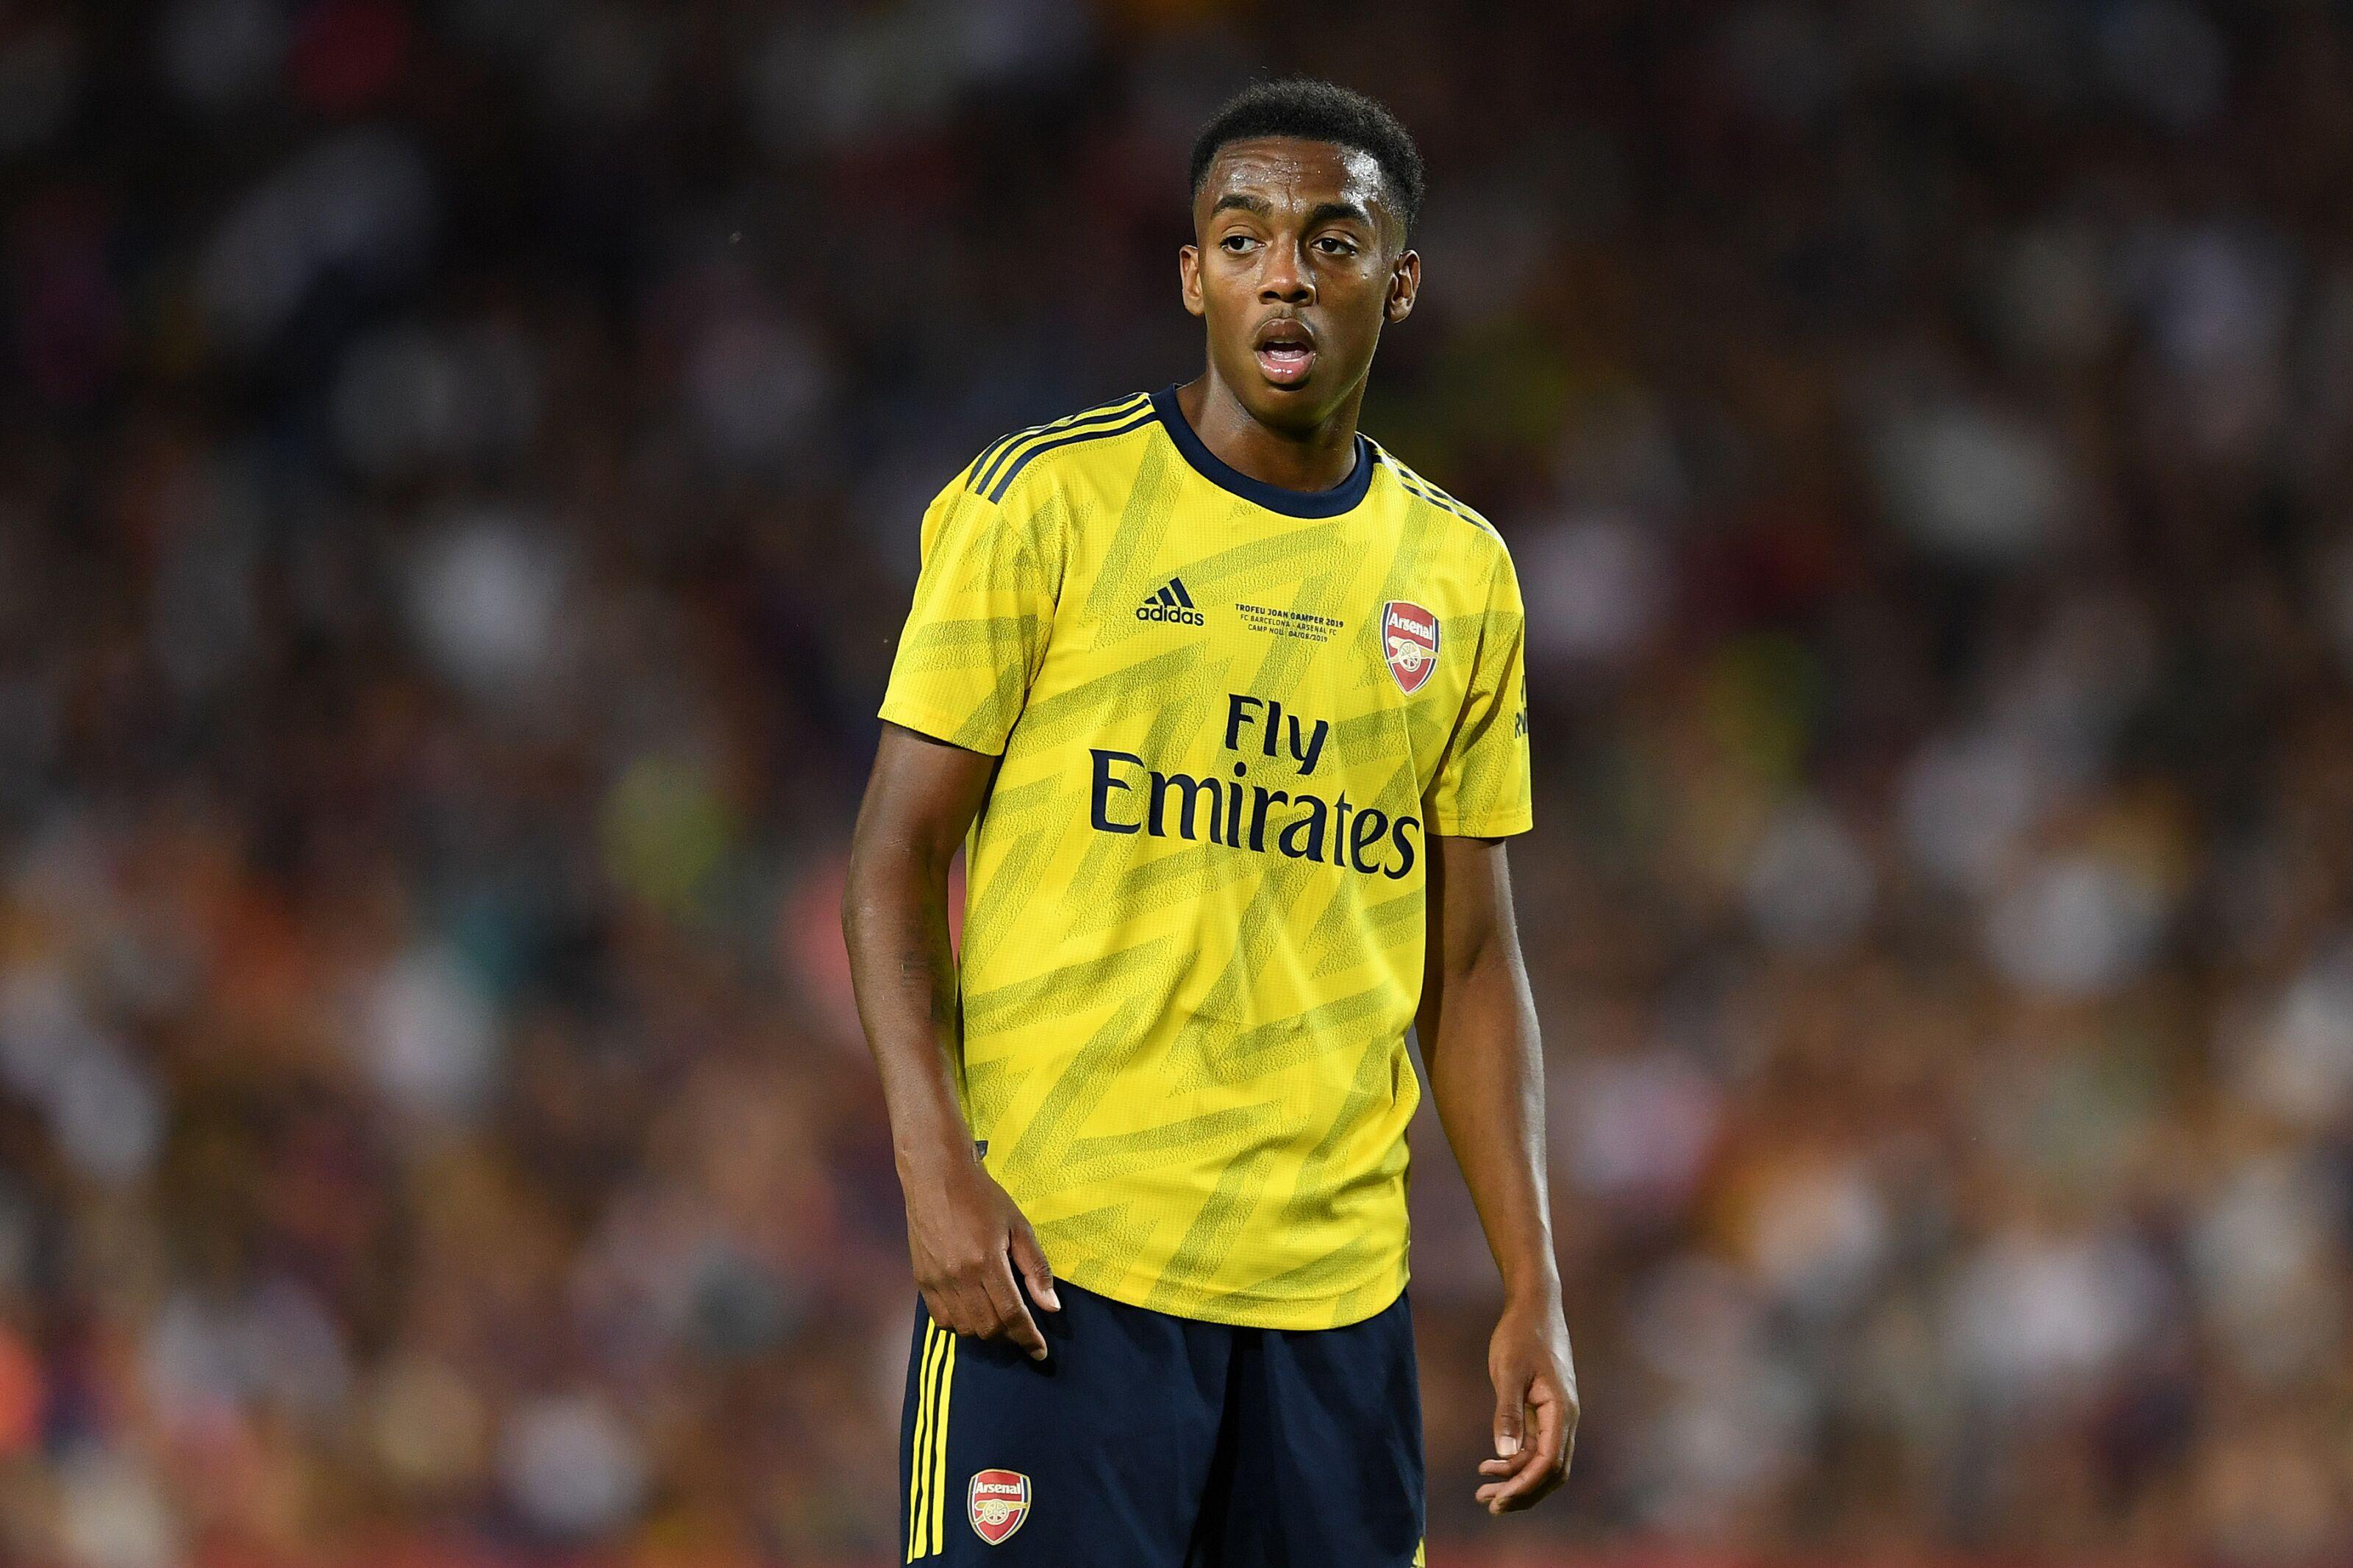 Arsenal: Joe Willock budding, but Aaron Ramsey still ages away